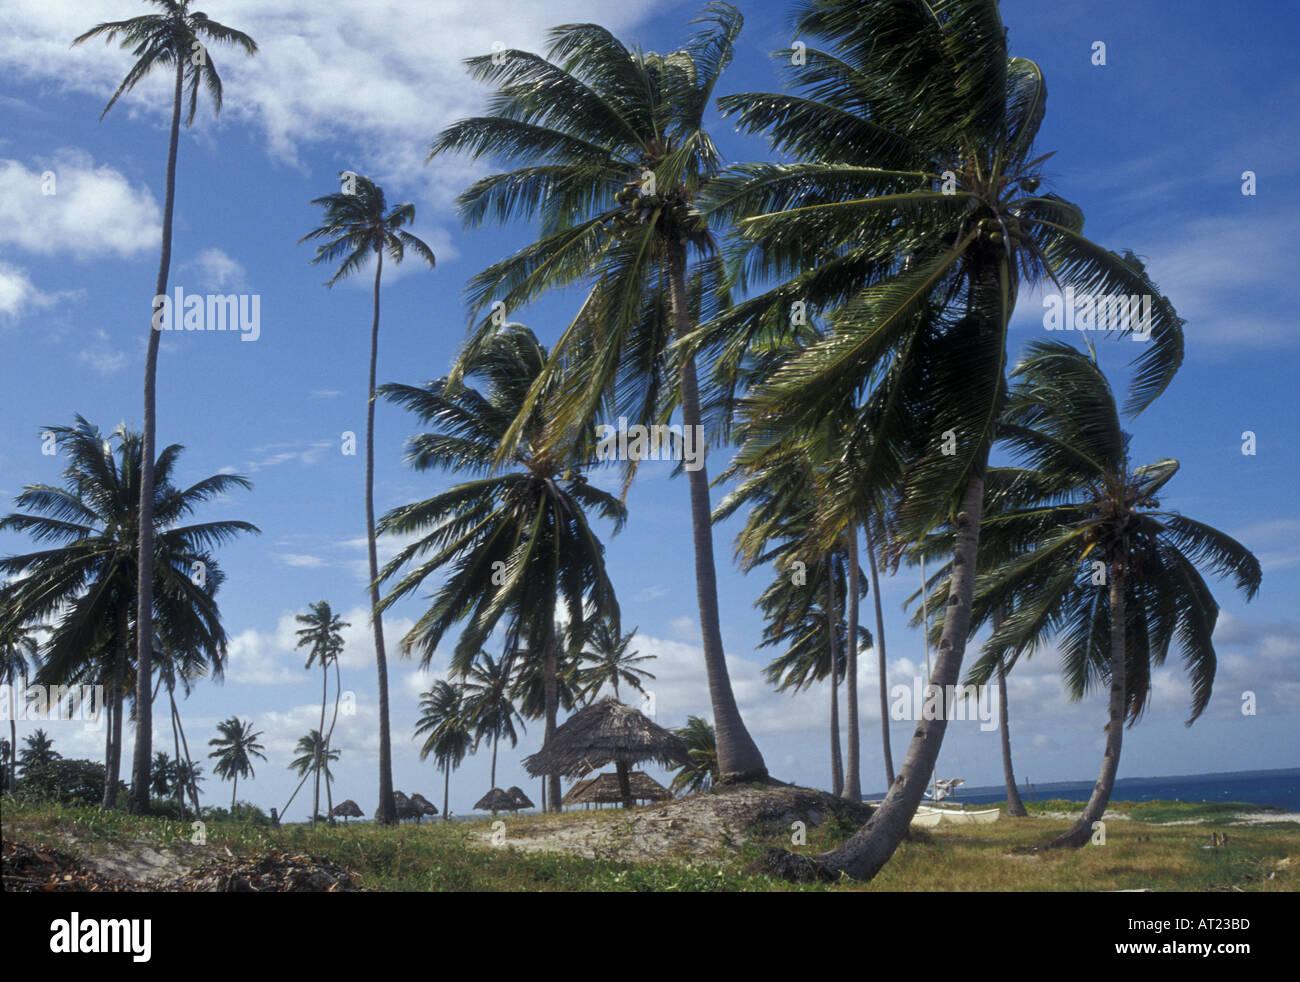 Mafia Island scene with coconut palms - Stock Image